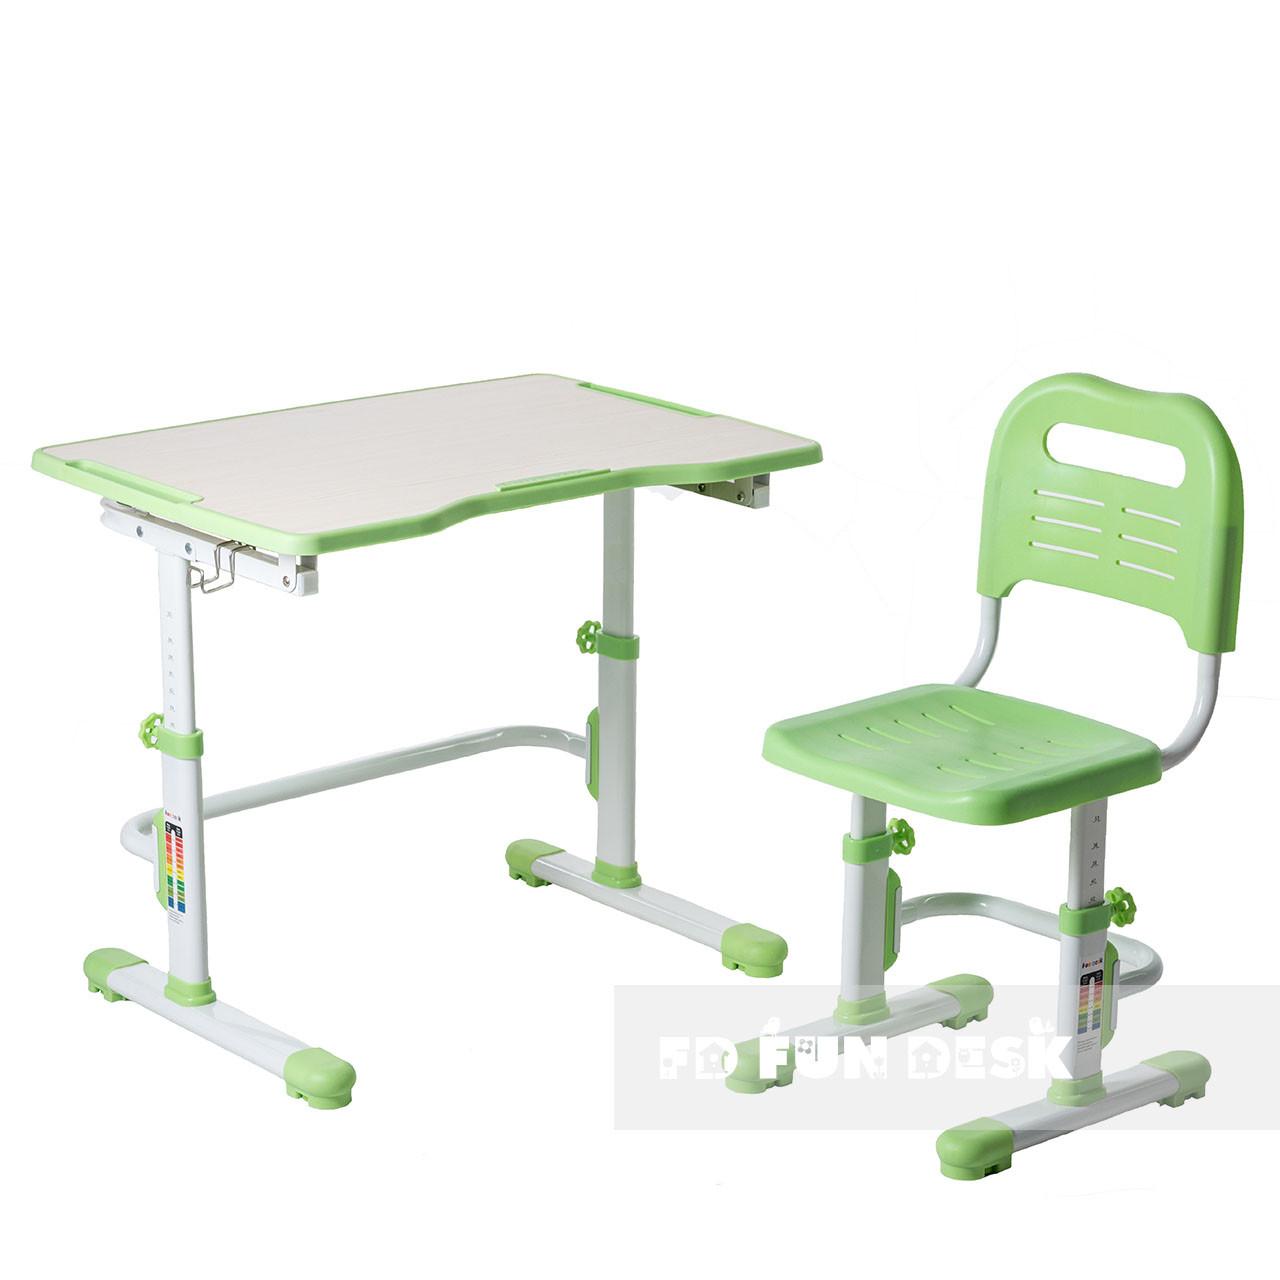 Комплект парта + стілець трансформери Vivo II Green FUNDESK